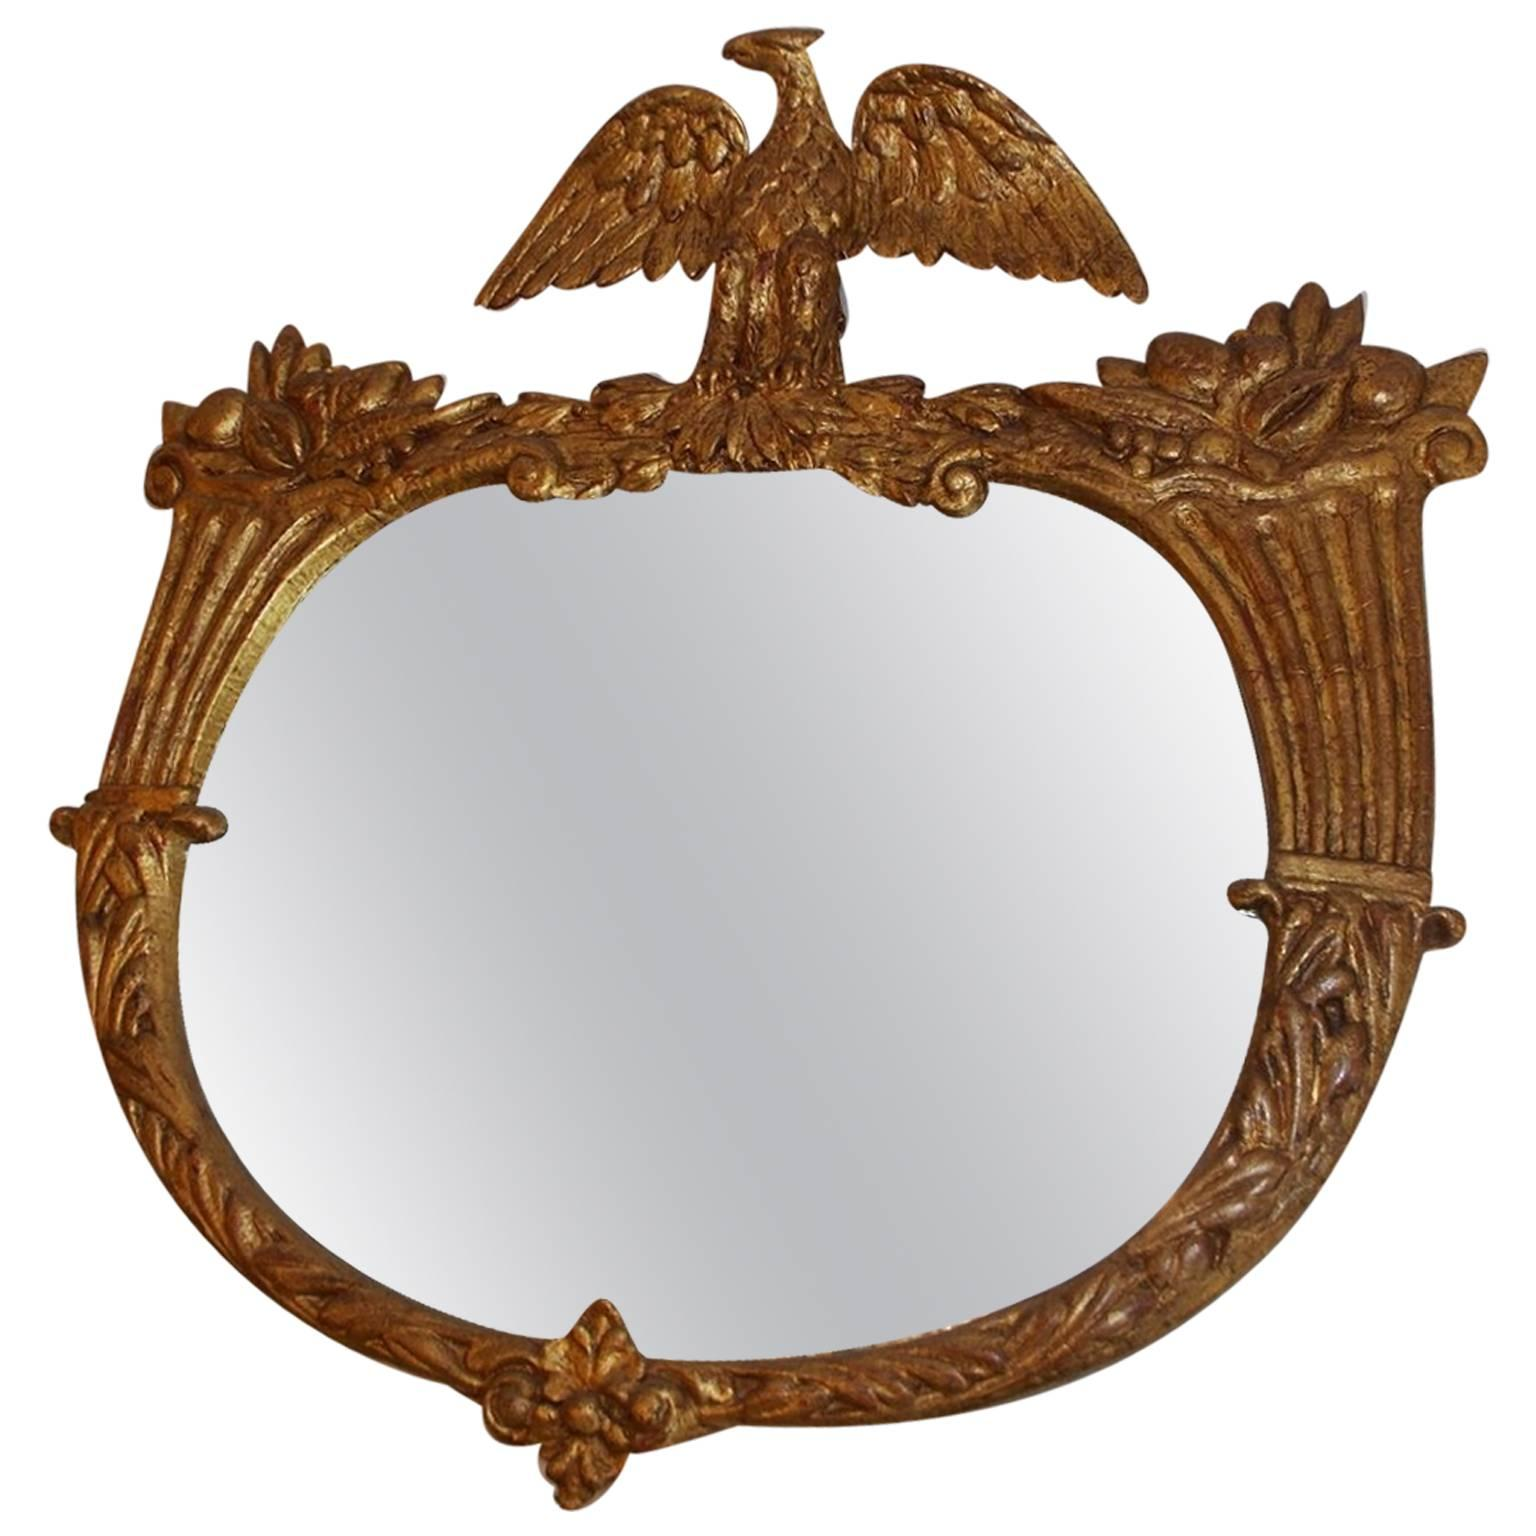 American Gilt Carved Wood Eagle & Cornucopia Wall Mirror, Circa 1830